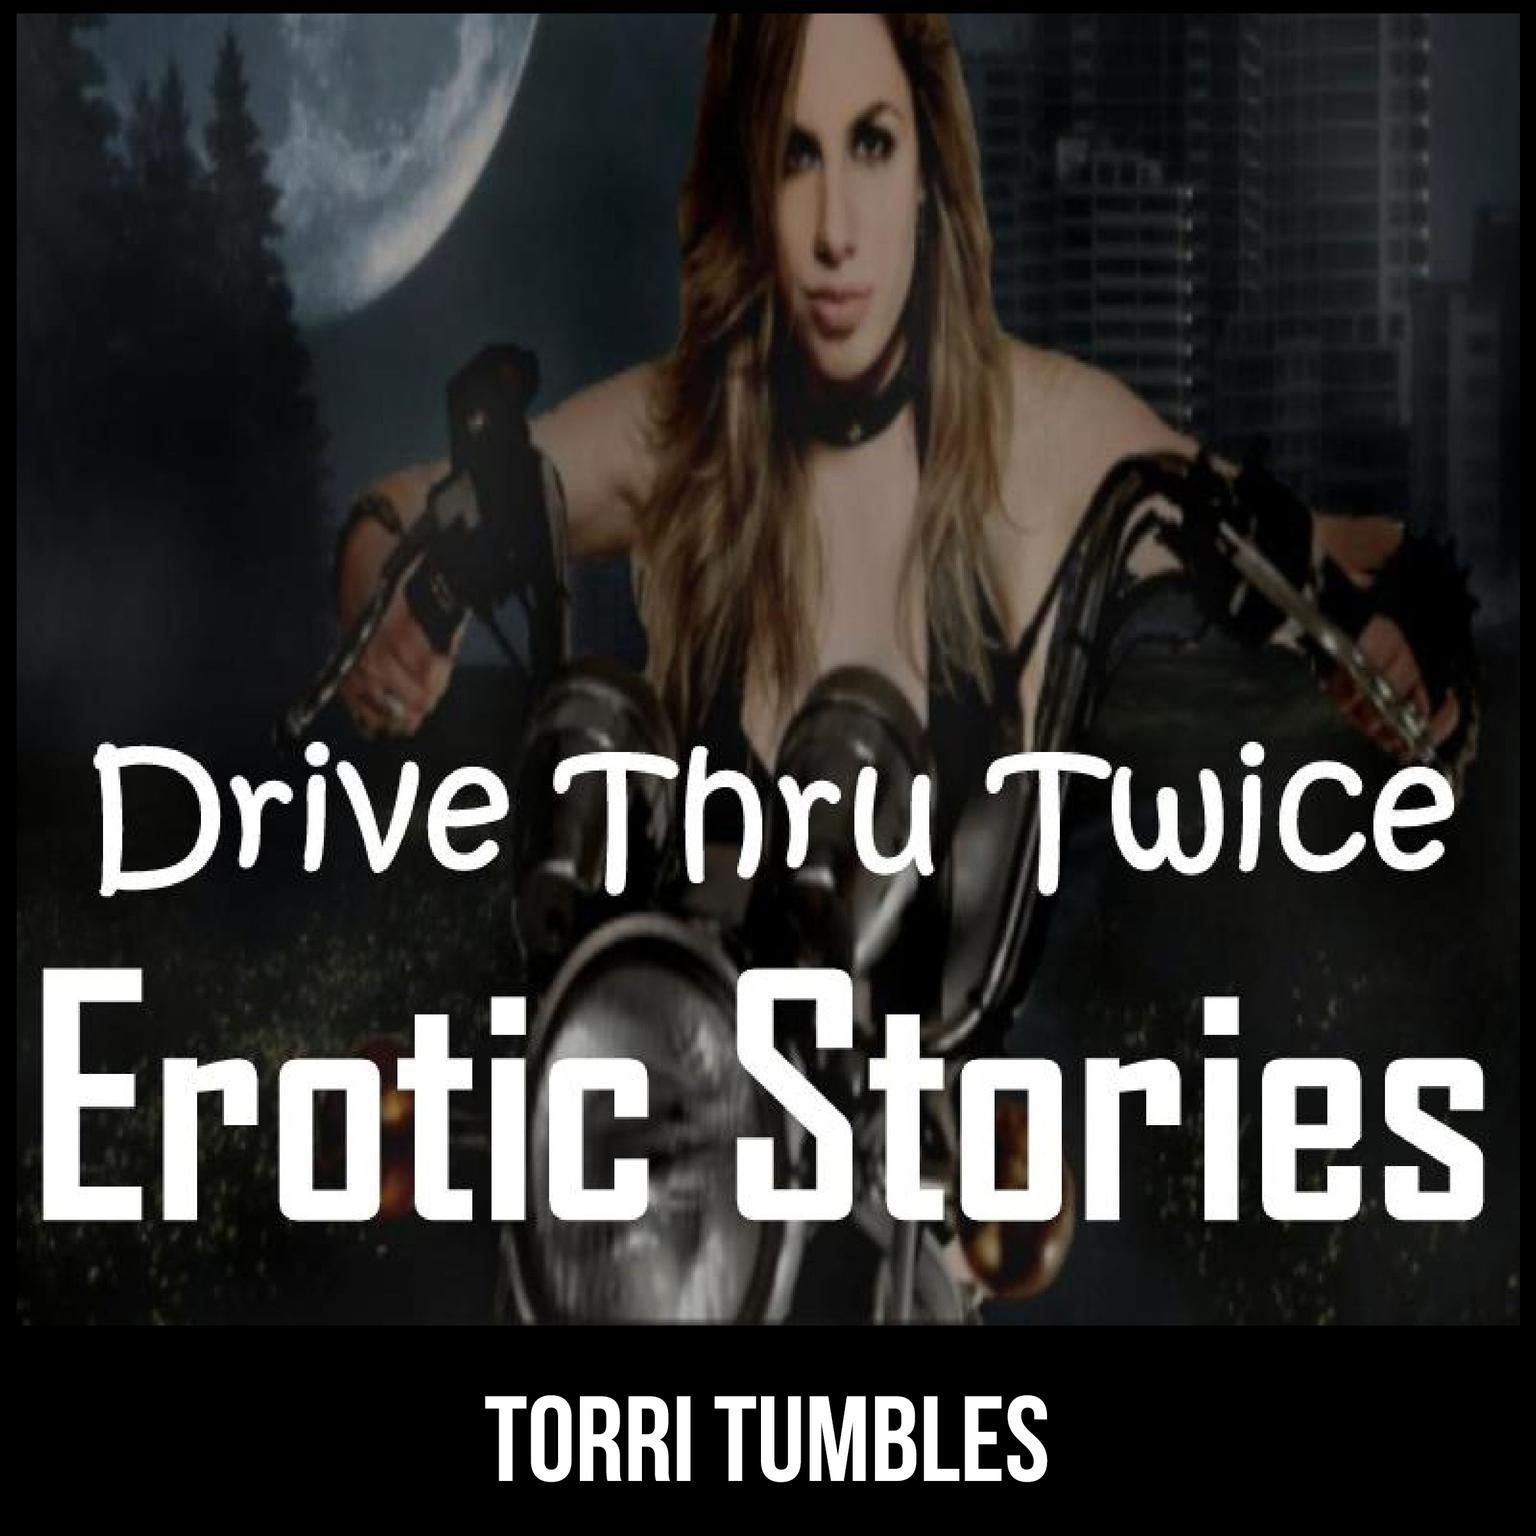 Drive Thru Twice Erotic Stories  Audiobook, by Torri Tumbles